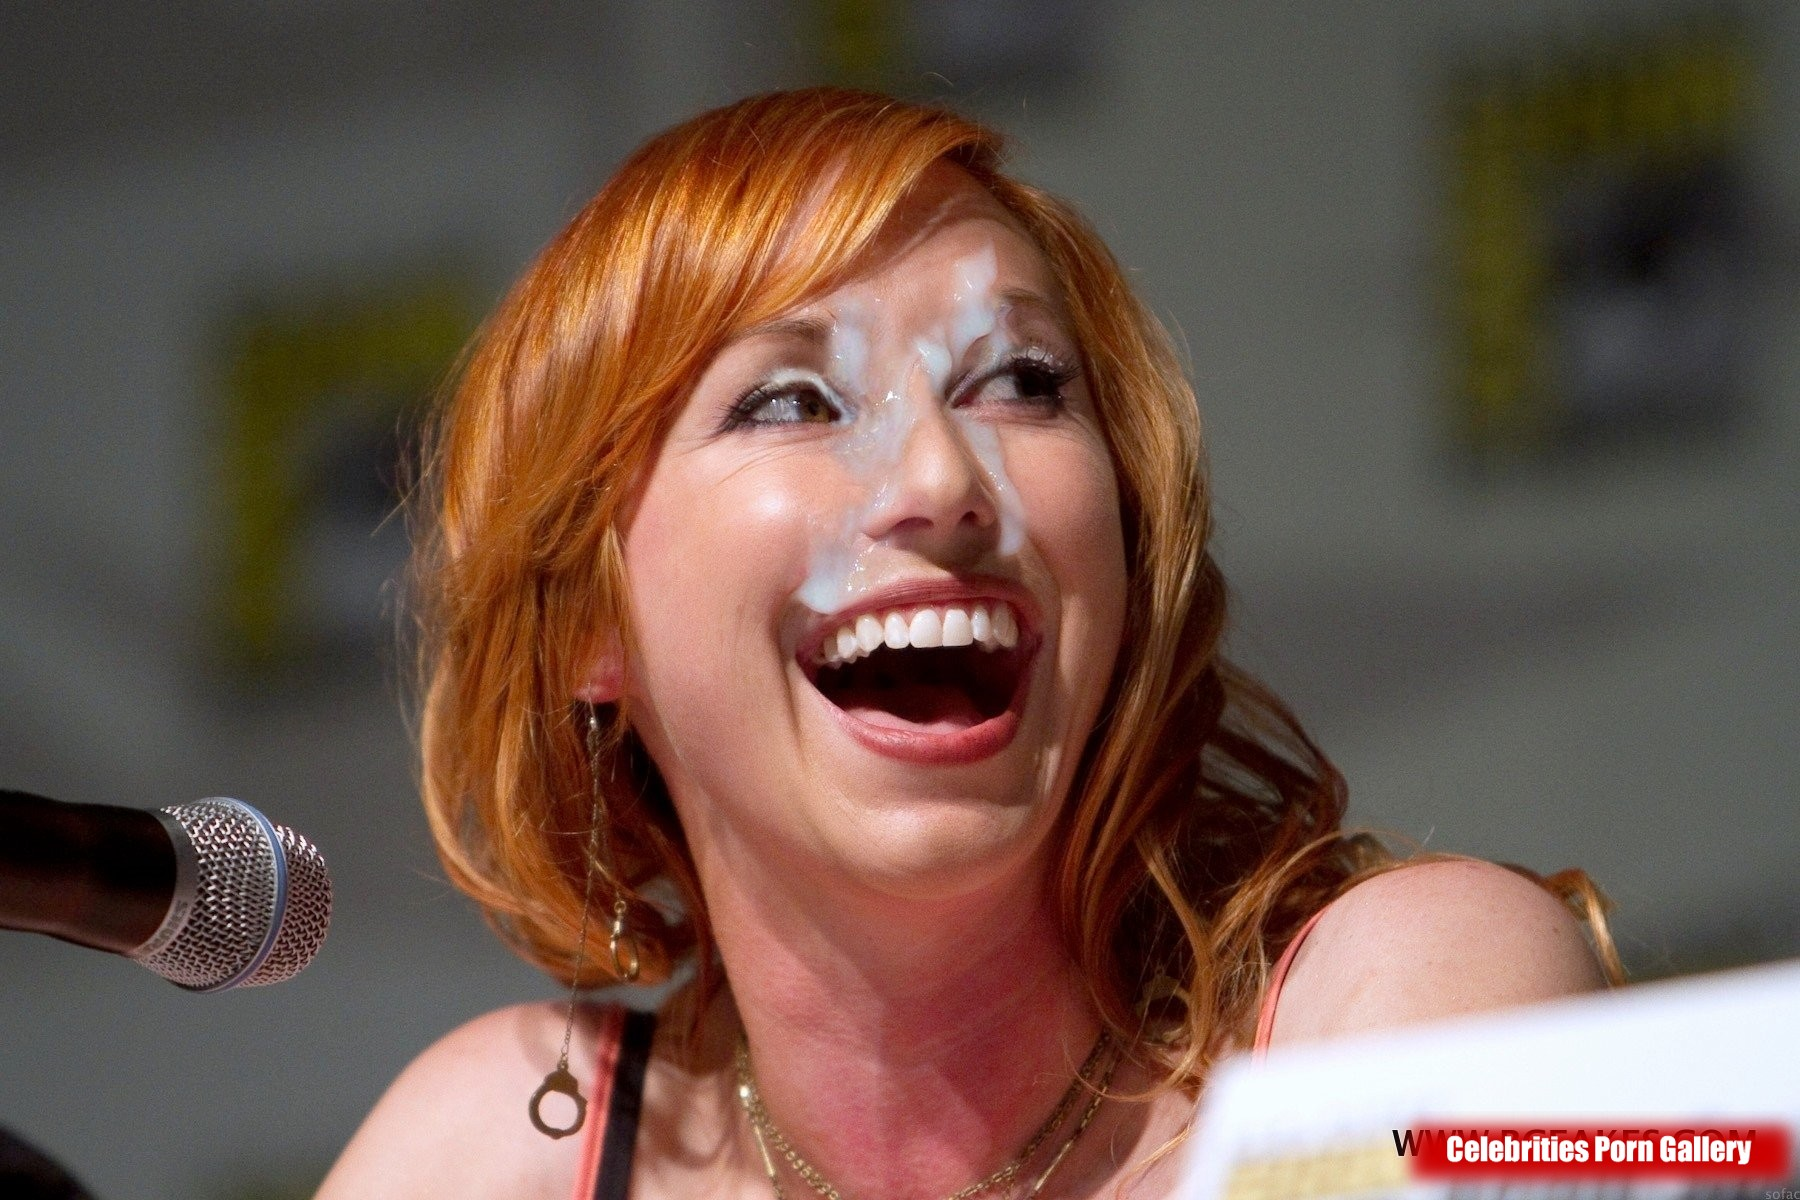 Kari Byron Cum Facial Fake 001 « Celebrity Fakes 4U